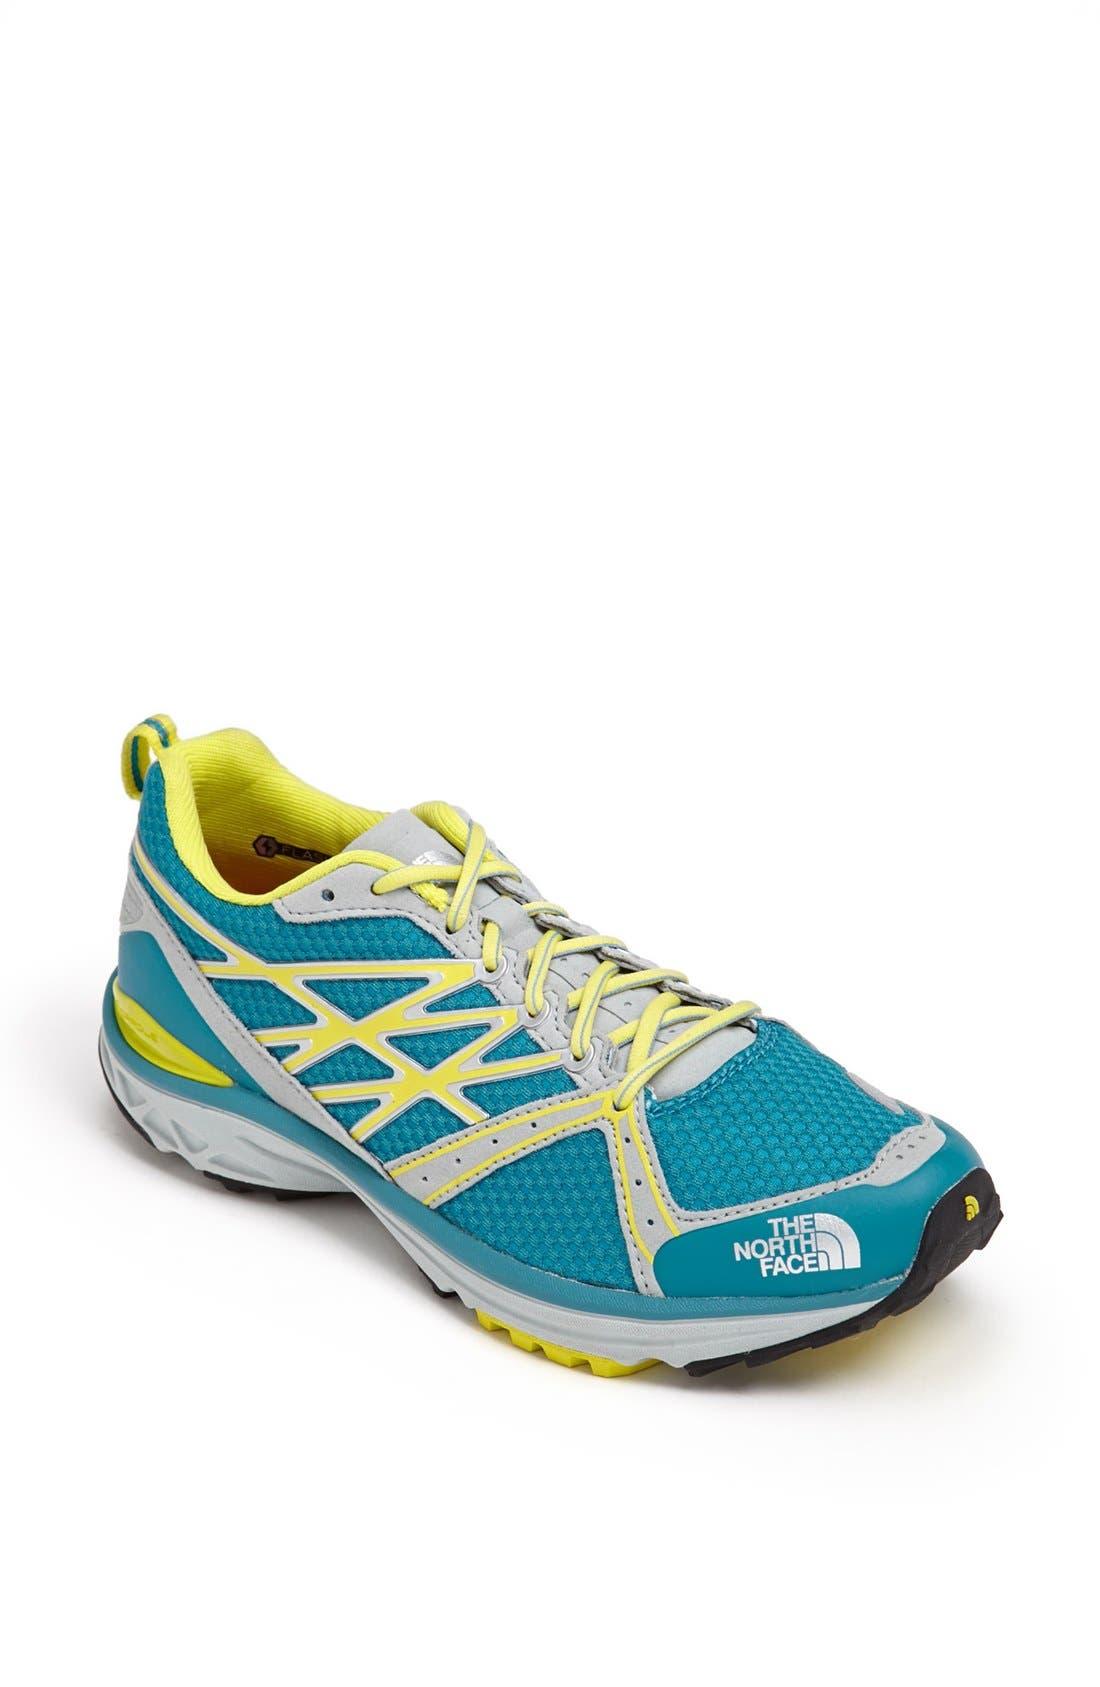 Main Image - The North Face 'Single Track 'Hayasa 11' Trail Running Shoe (Women)